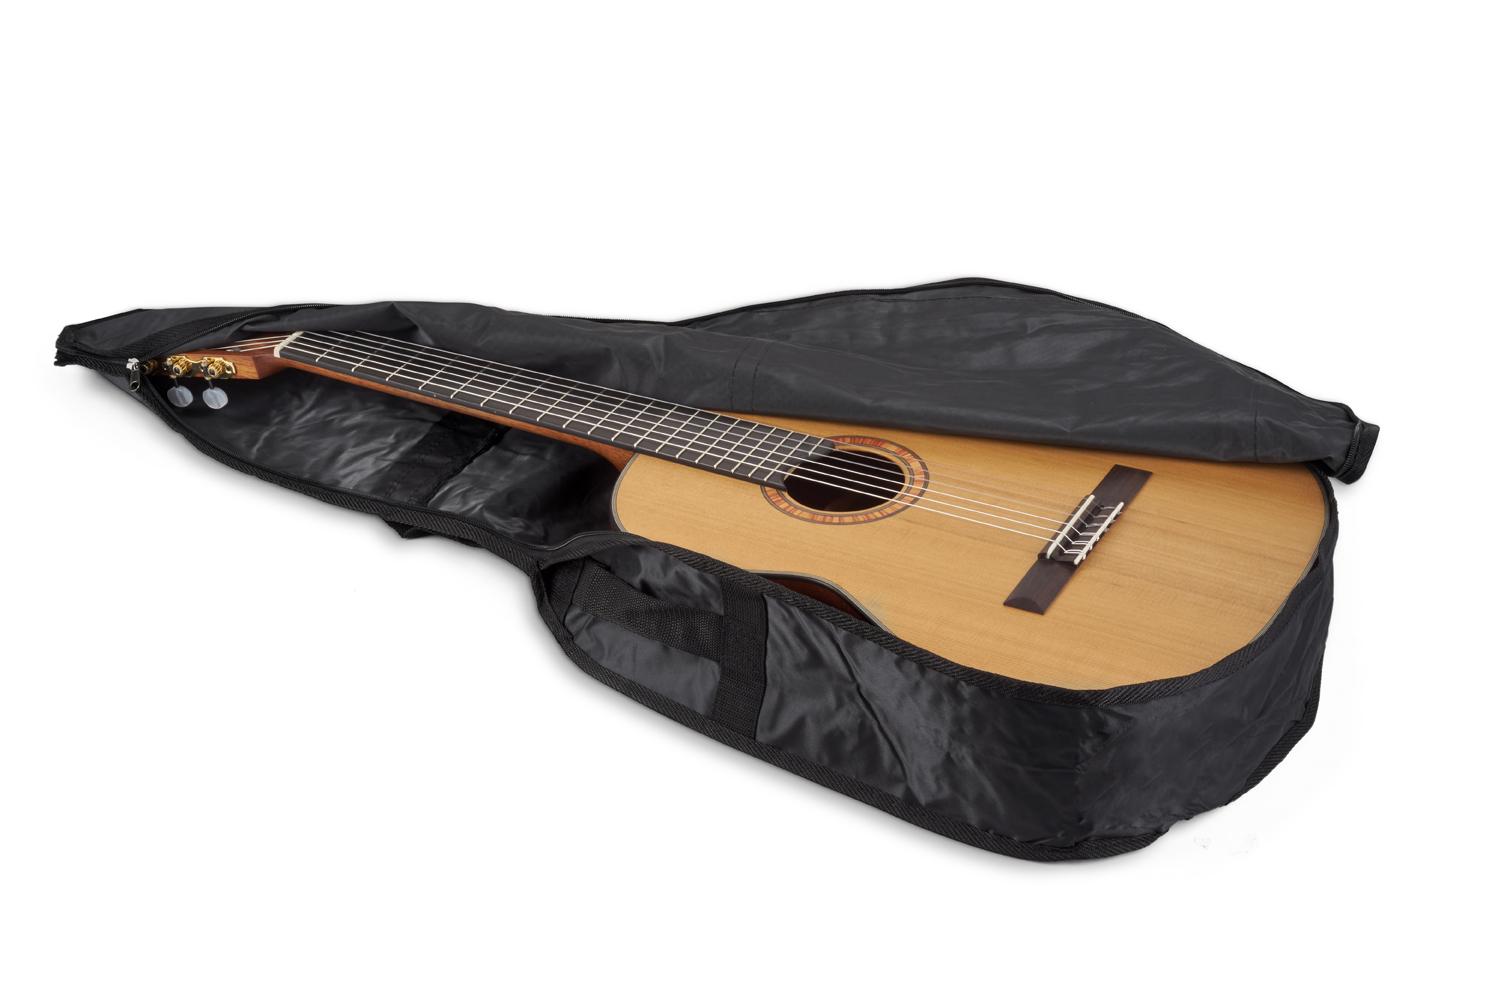 RockBag RB 20538 B Black Classical